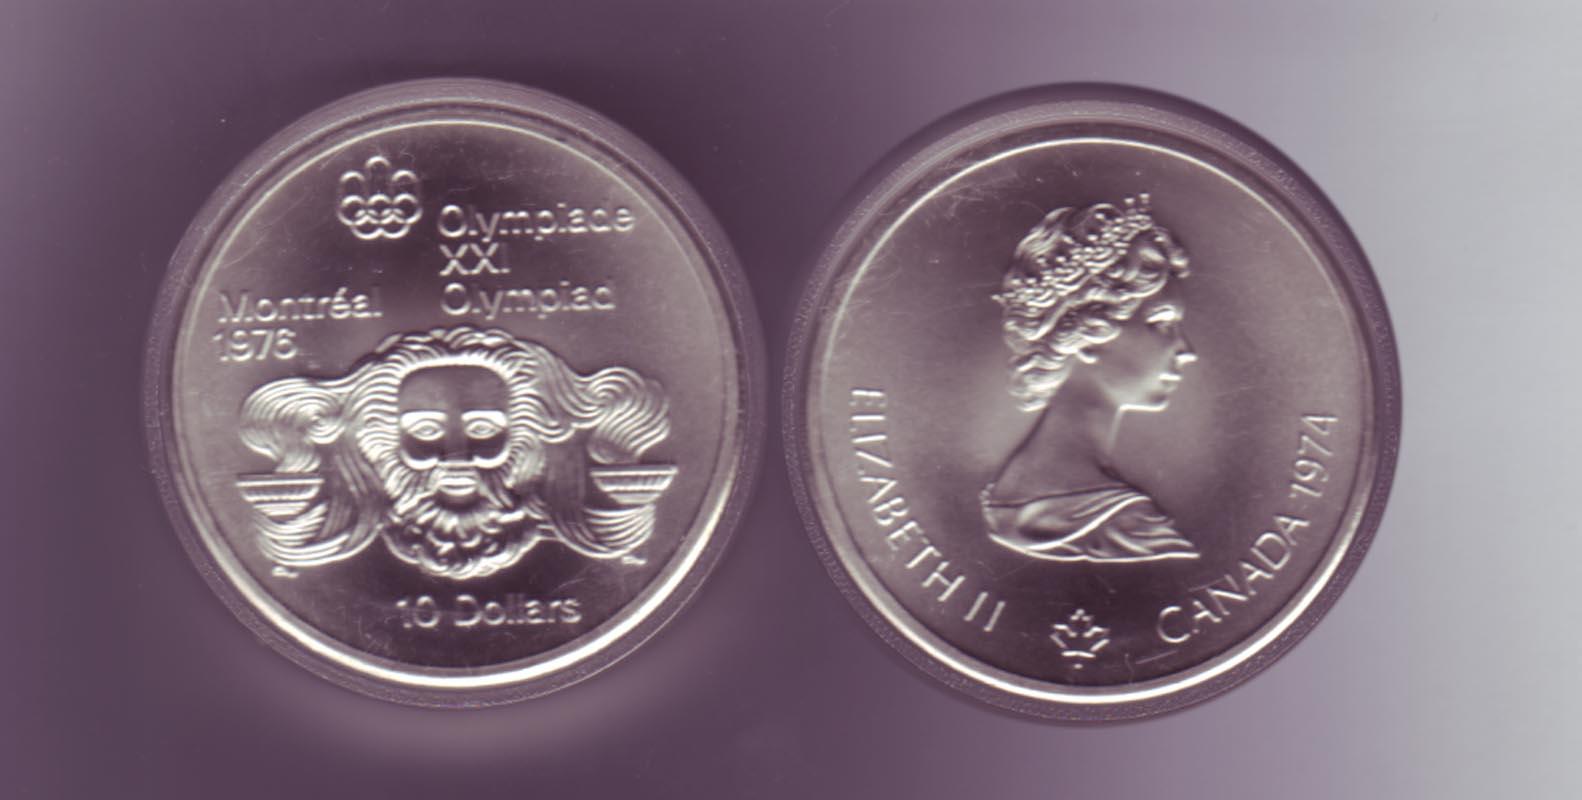 Silbermünze Kanada 10 Dollars Olympiade Montreal 1976 Zeuss